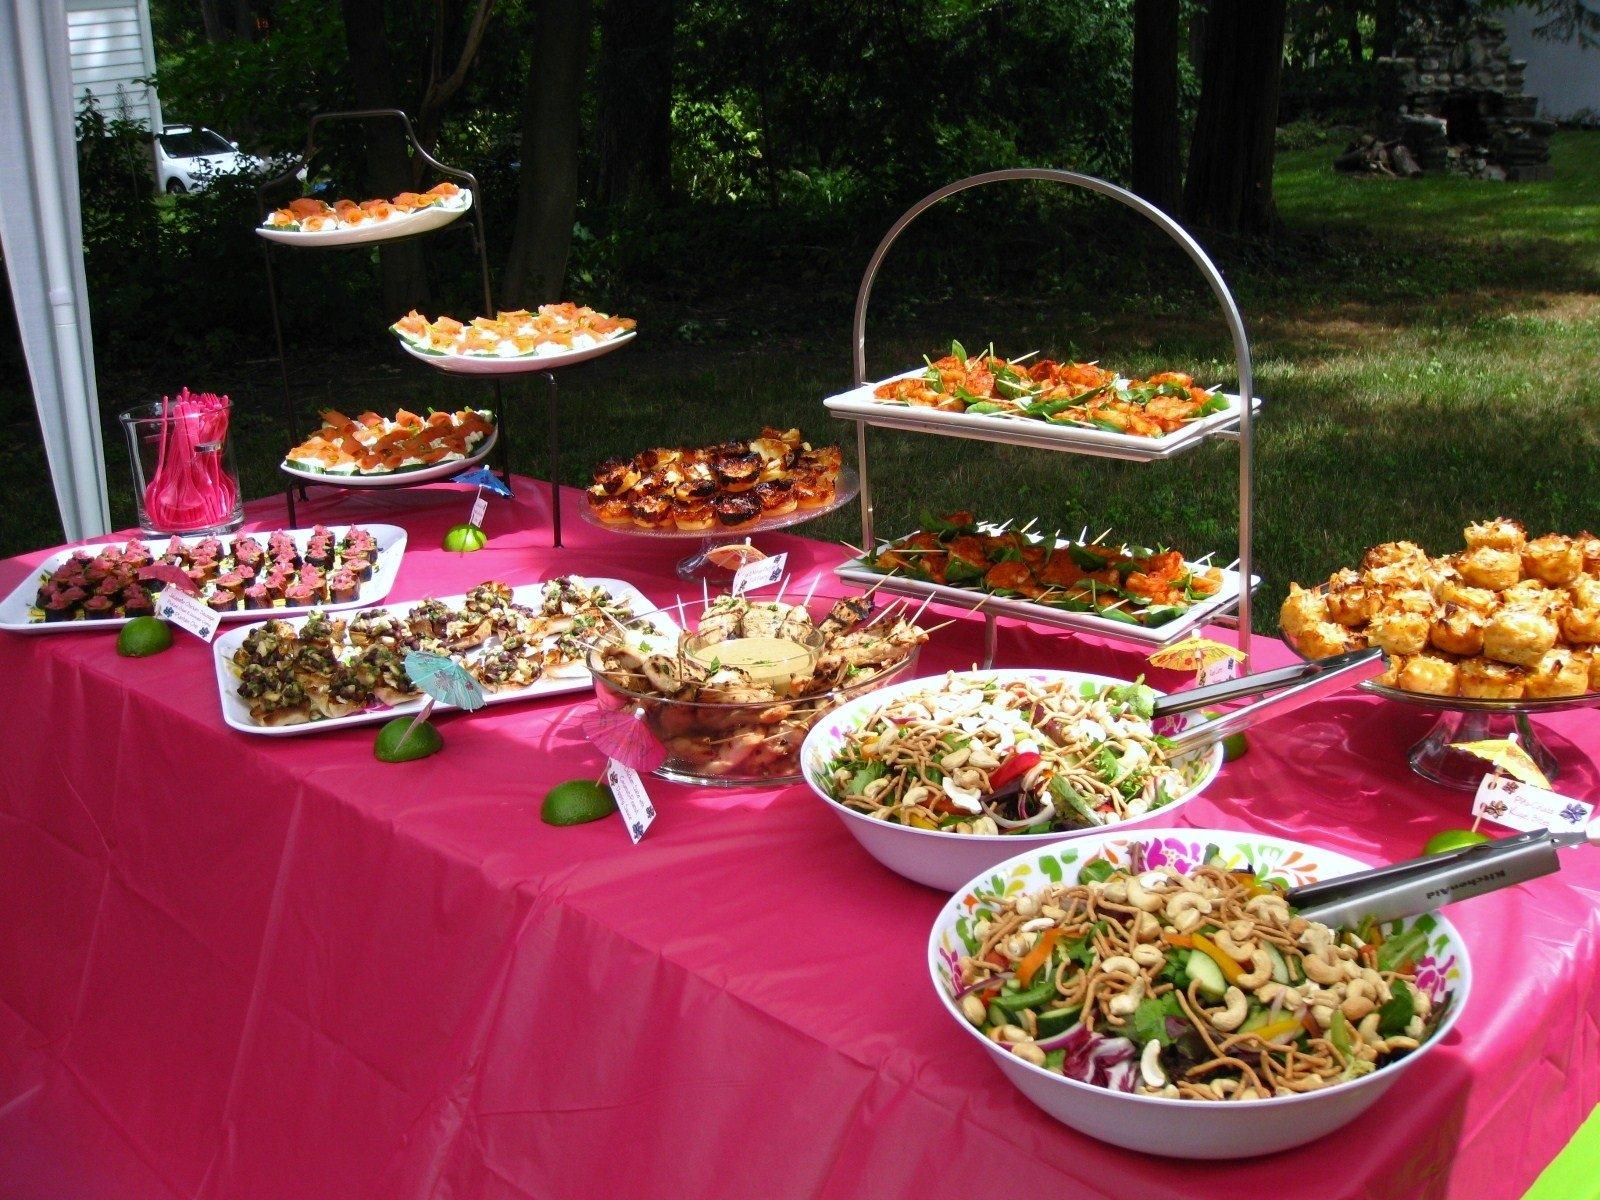 10 Cute Creative Bridal Shower Food Ideas ideas for bridal shower food fresh hawaii themed bridal shower 2020